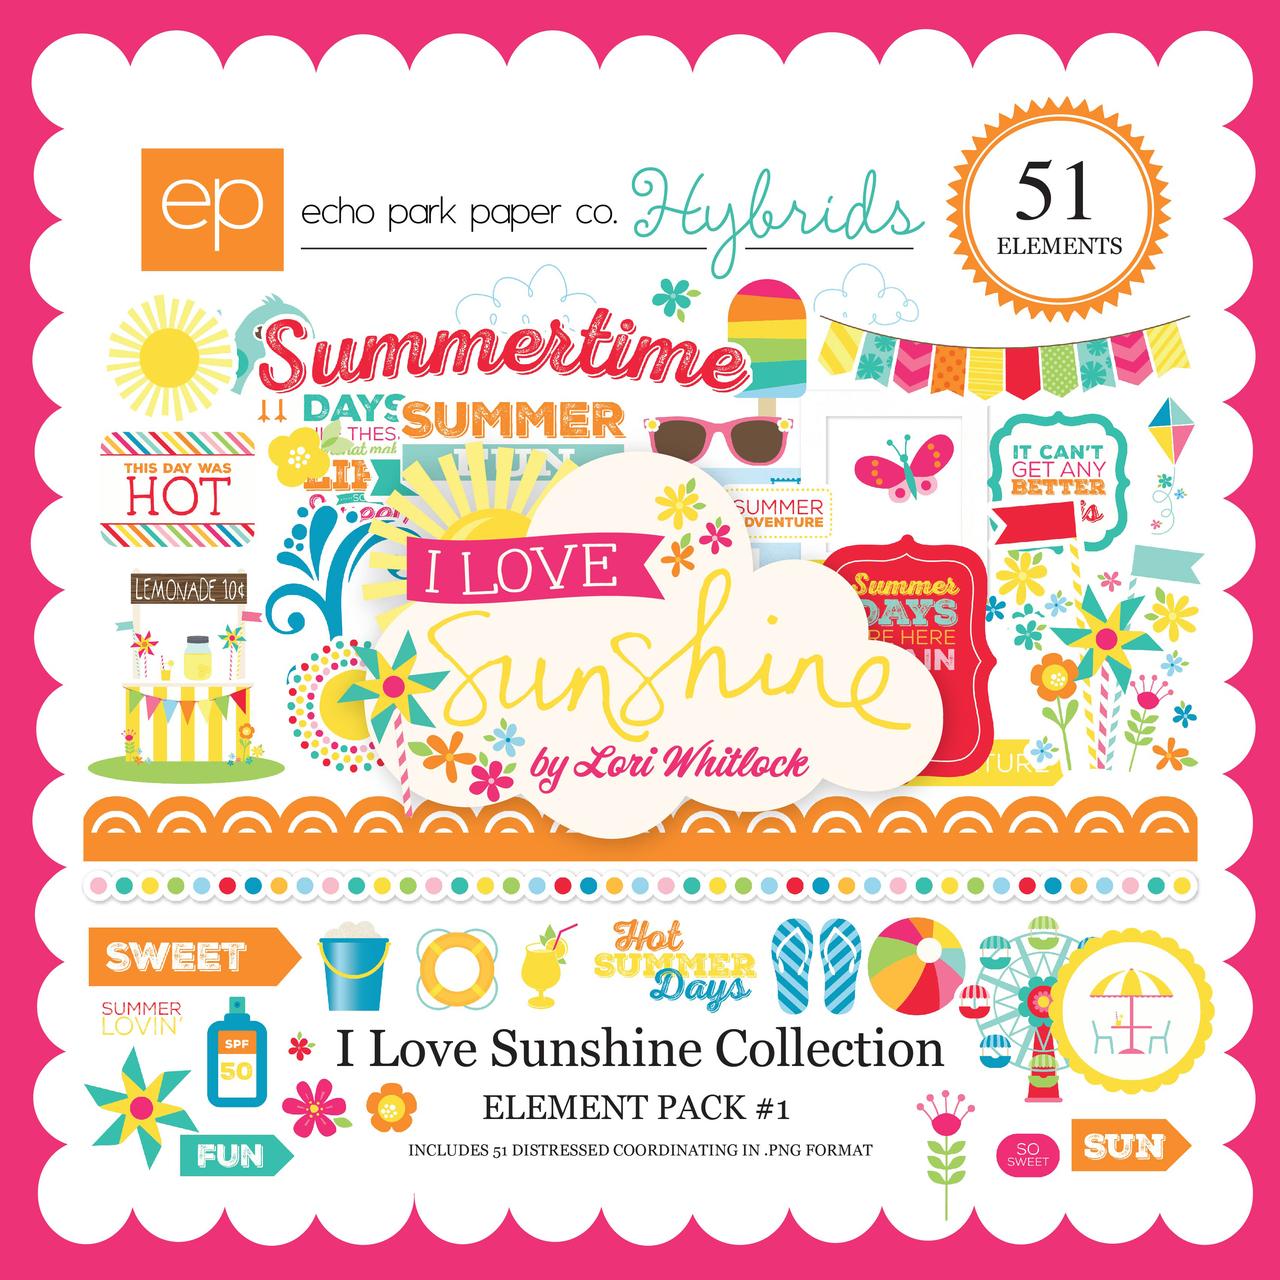 I Love Sunshine Element Pack #1